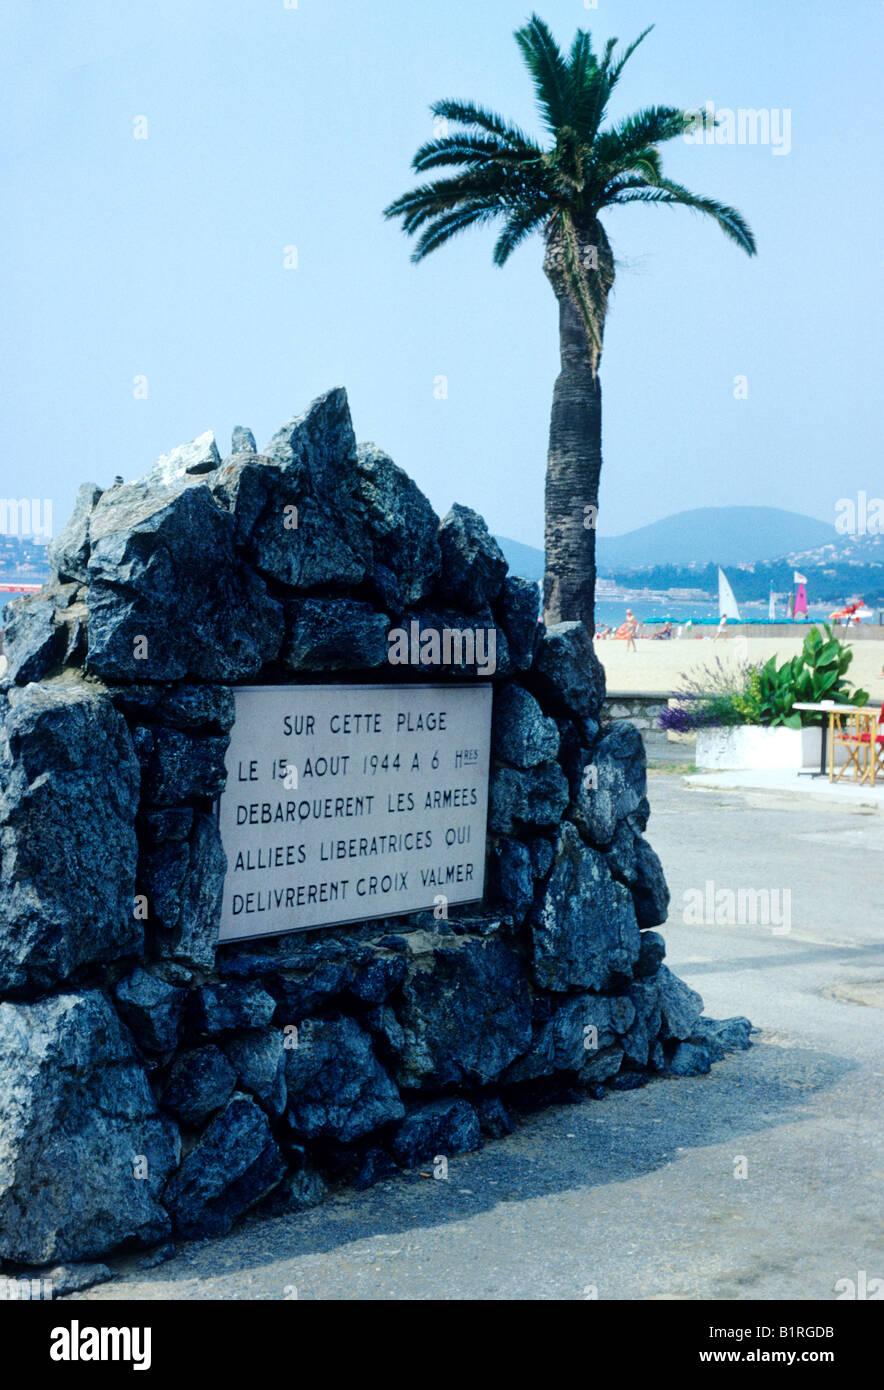 La Croix Valmer beach 2nd World War commemorative plaque France liberation 1944 by Allies allied landing place Cote - Stock Image